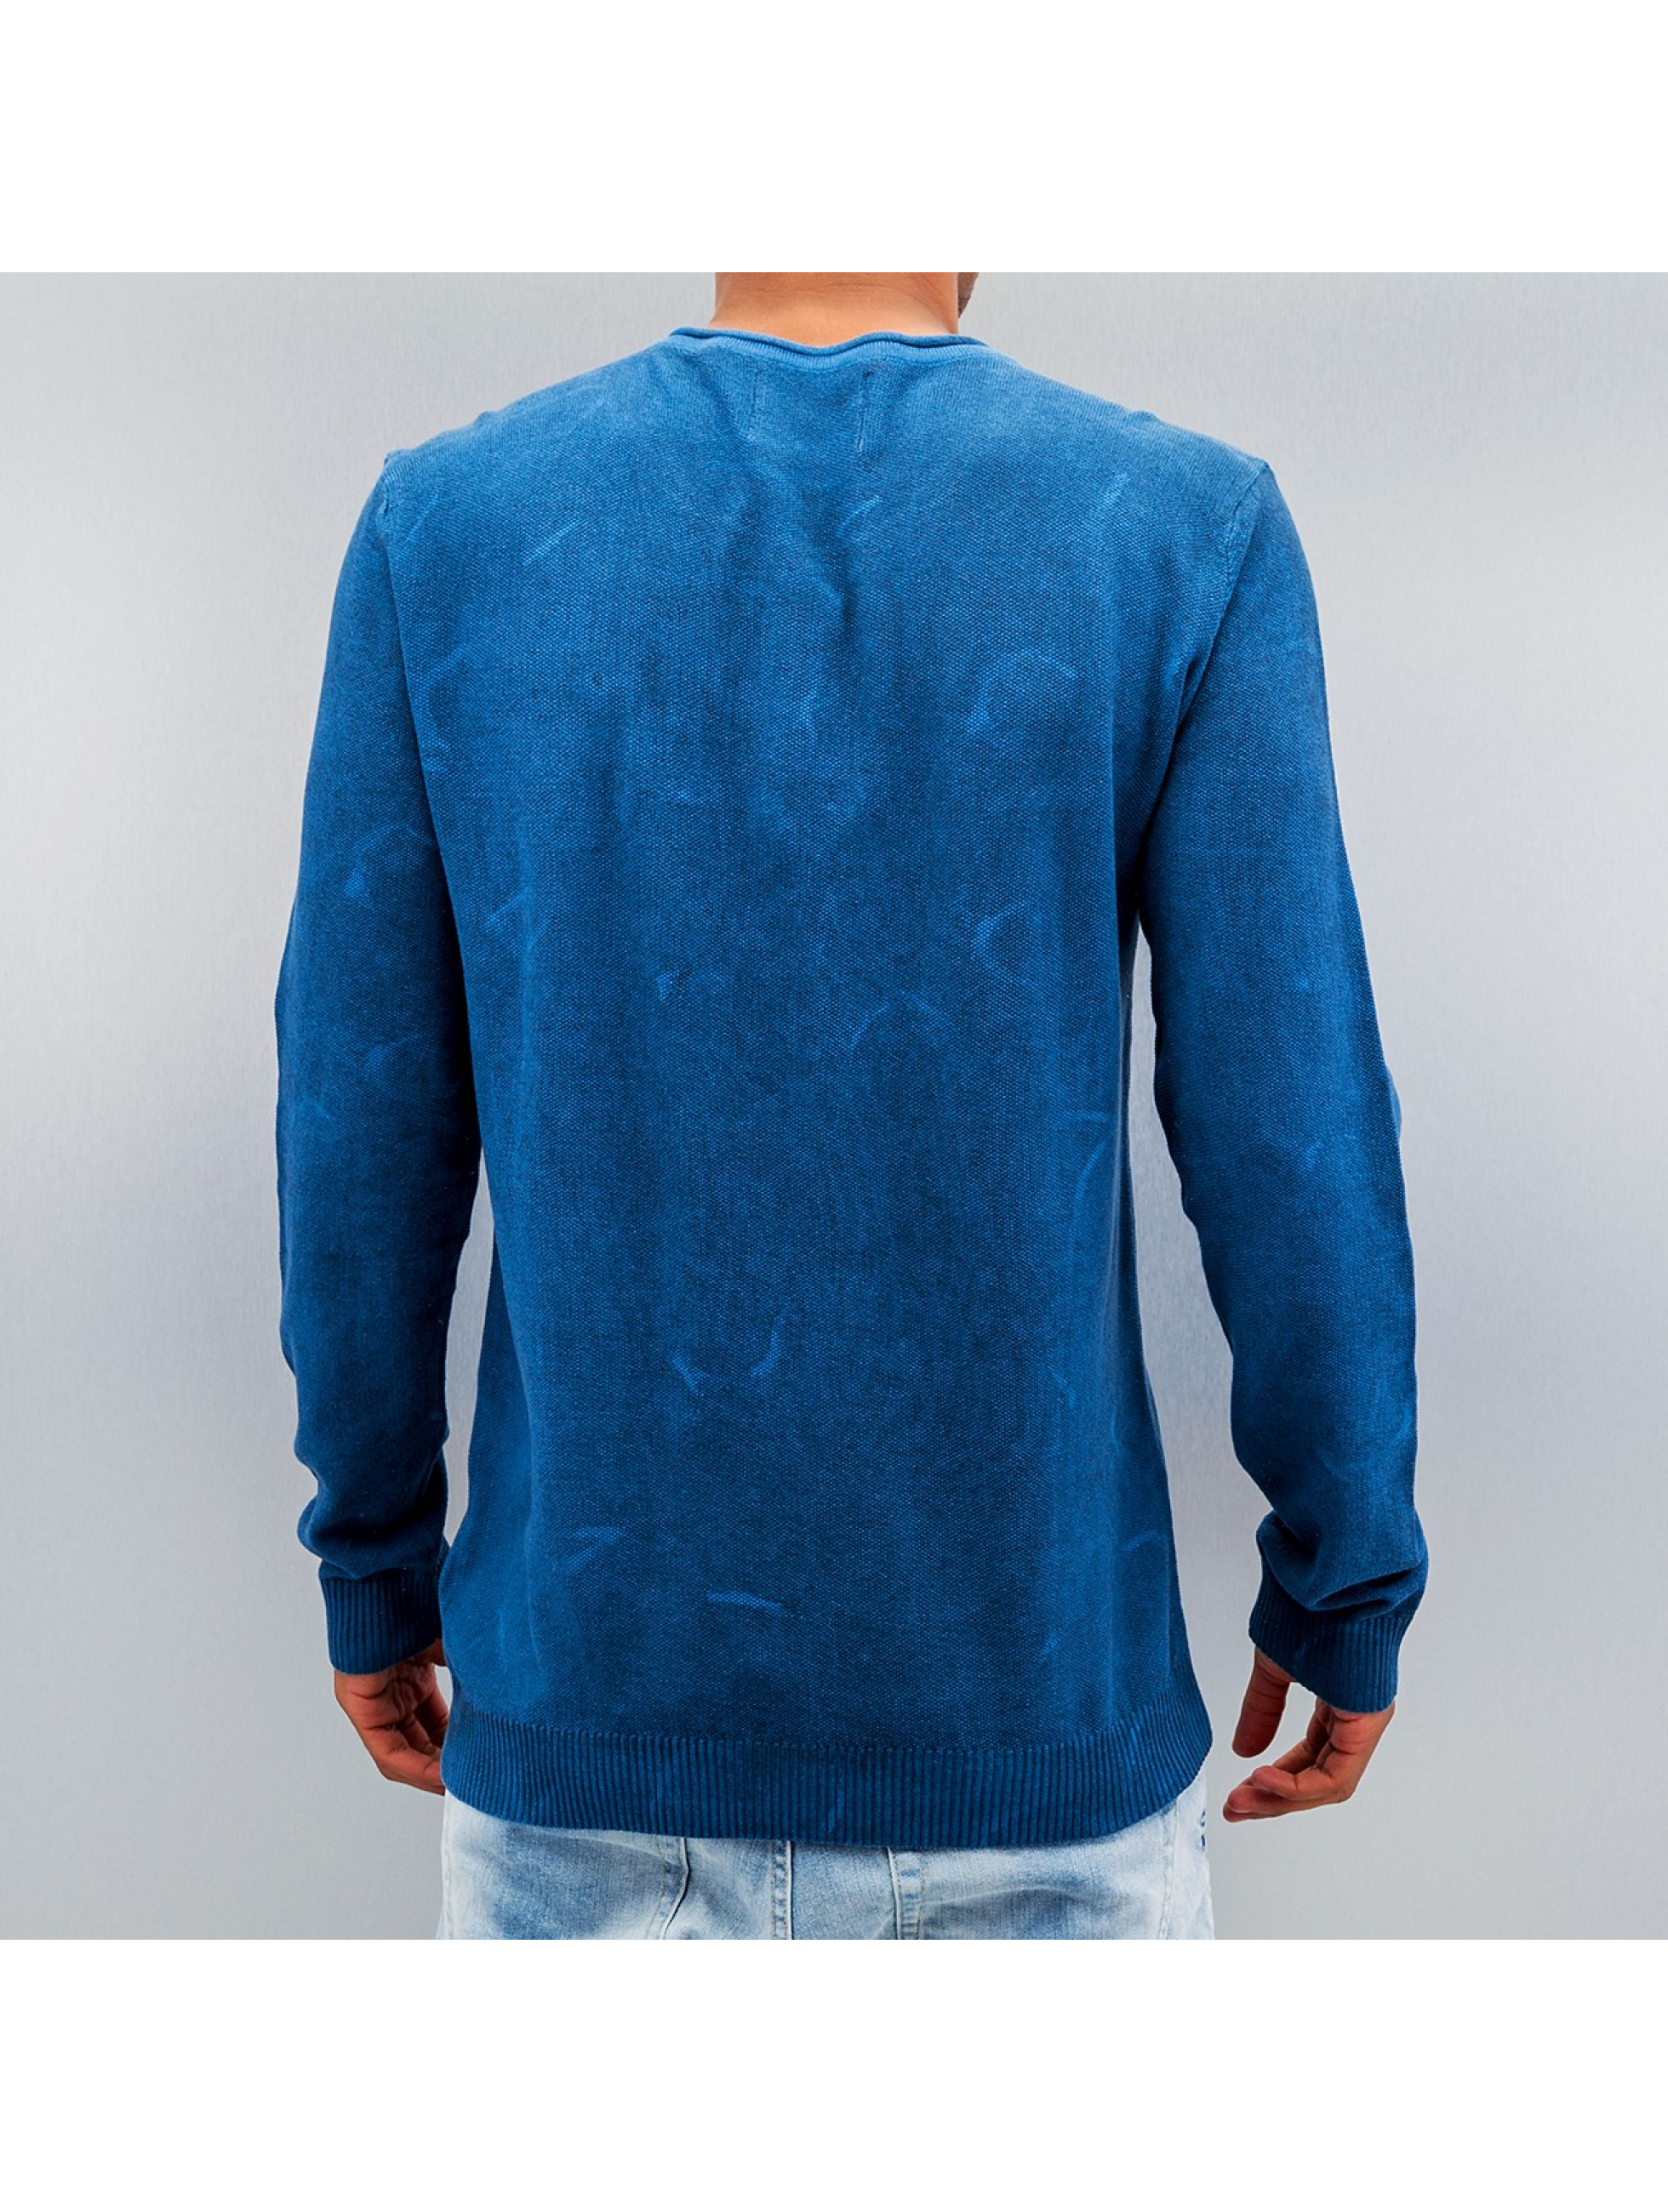 Petrol Industries Пуловер Pocket синий